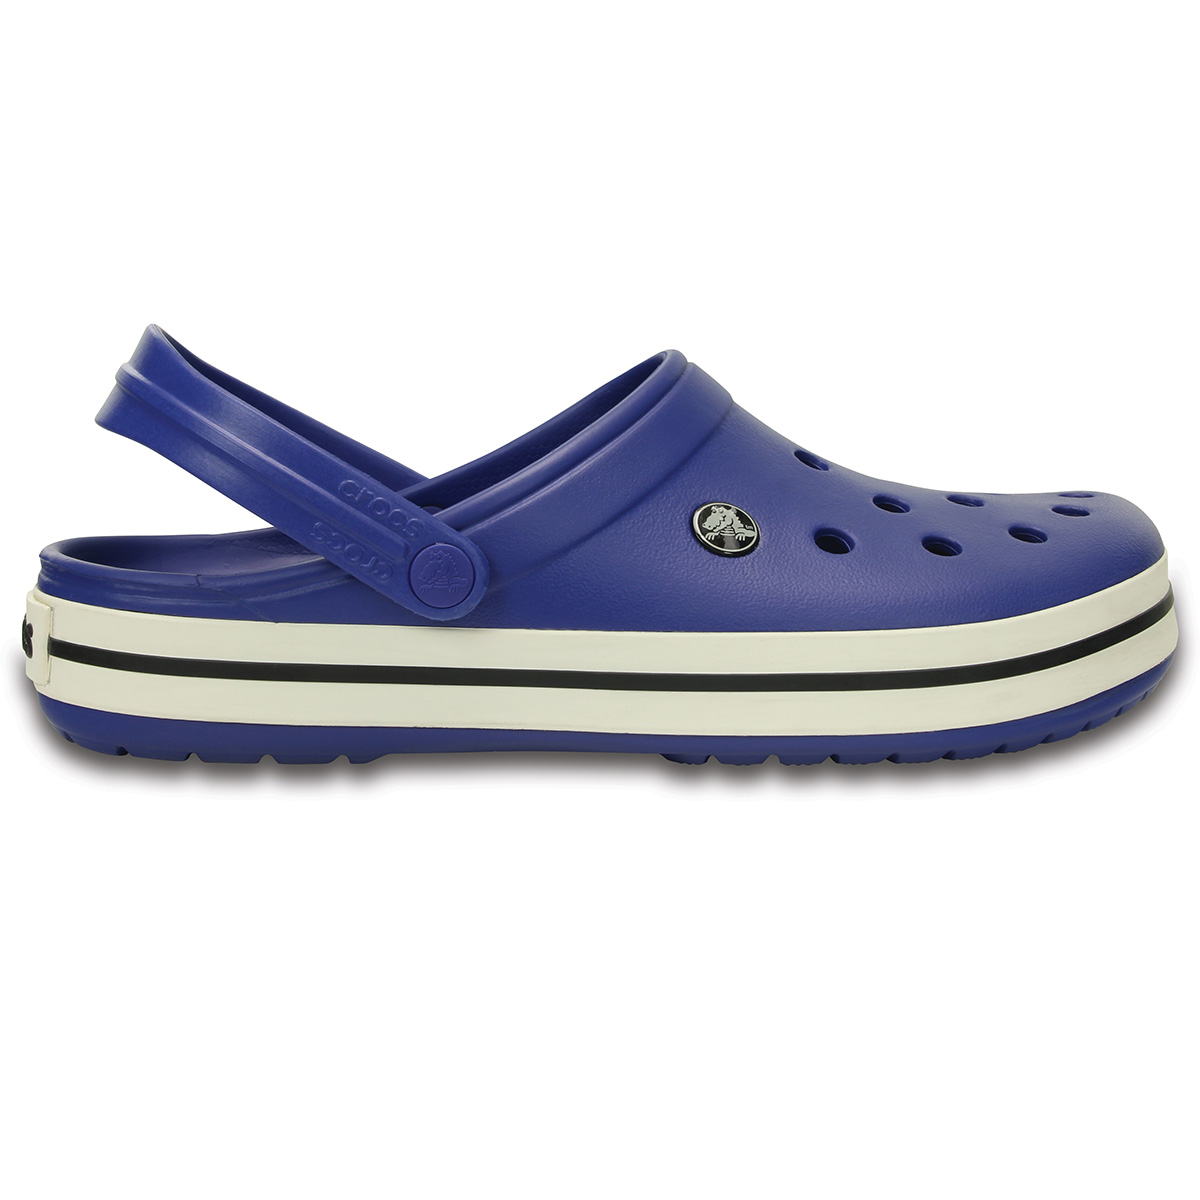 Crocs Crocband - Gök Mavisi/İstiridye